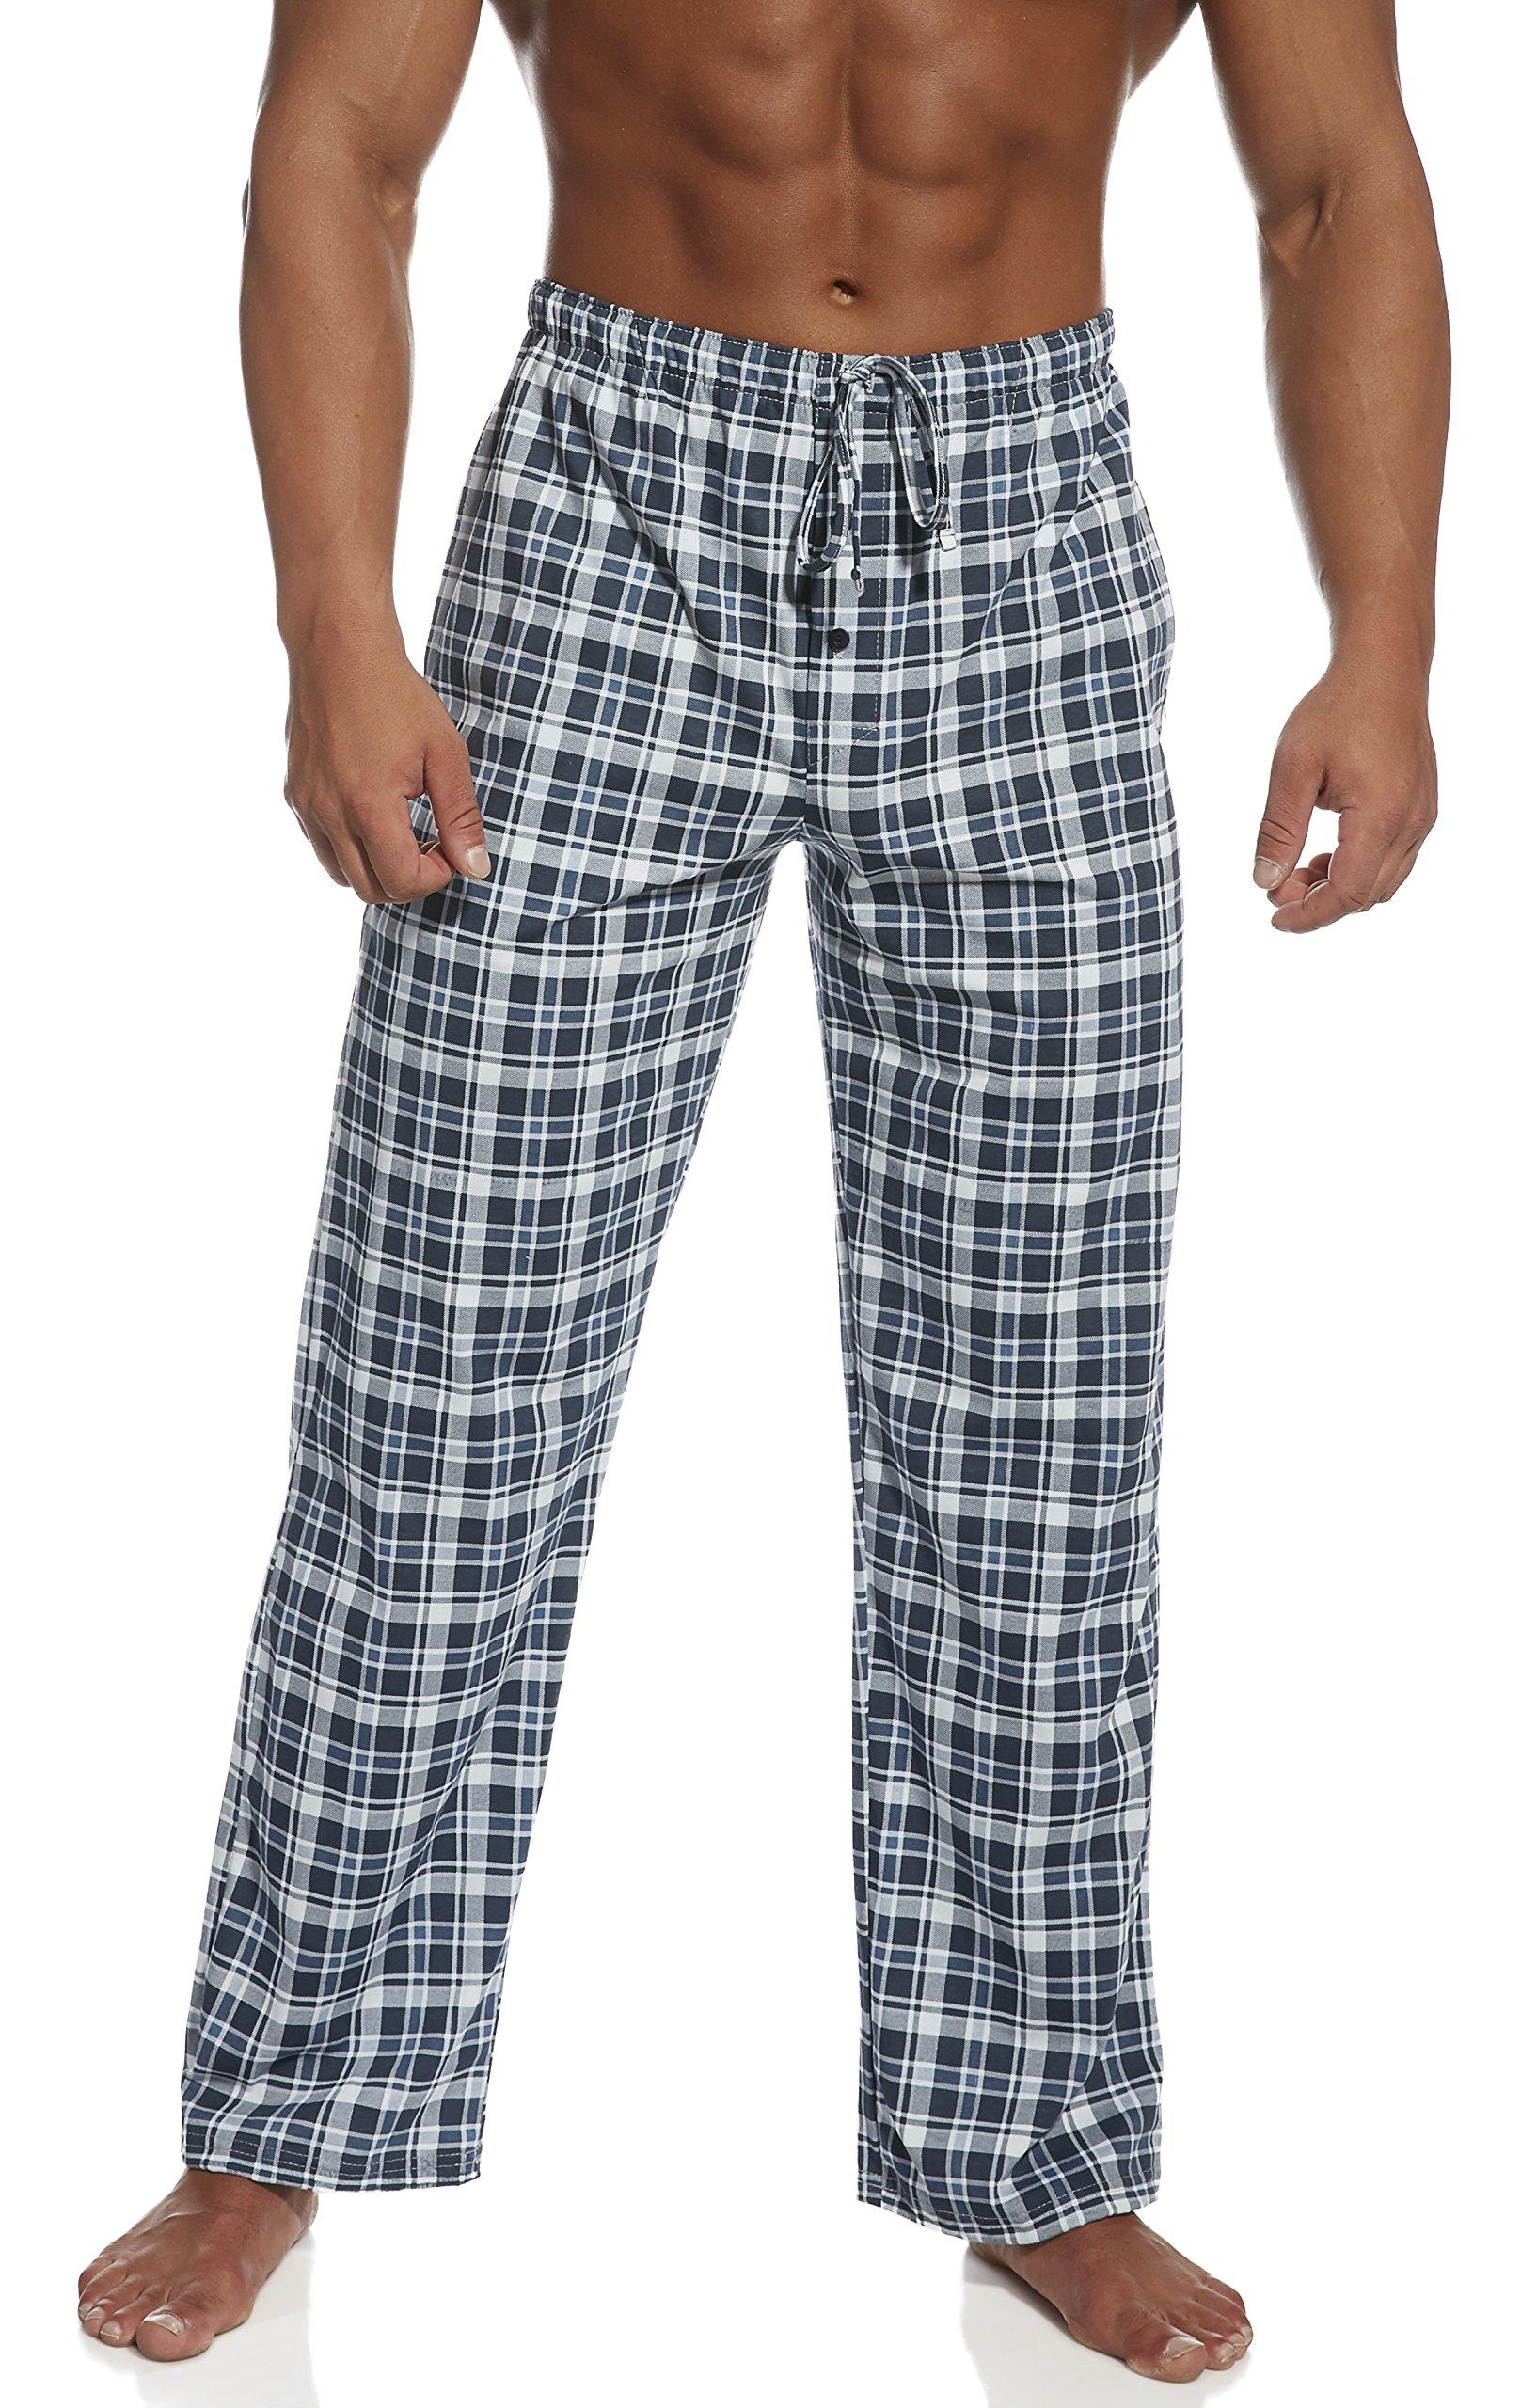 Cornette Hombre Pantalones de Pijamas Ropa CR-691 product image